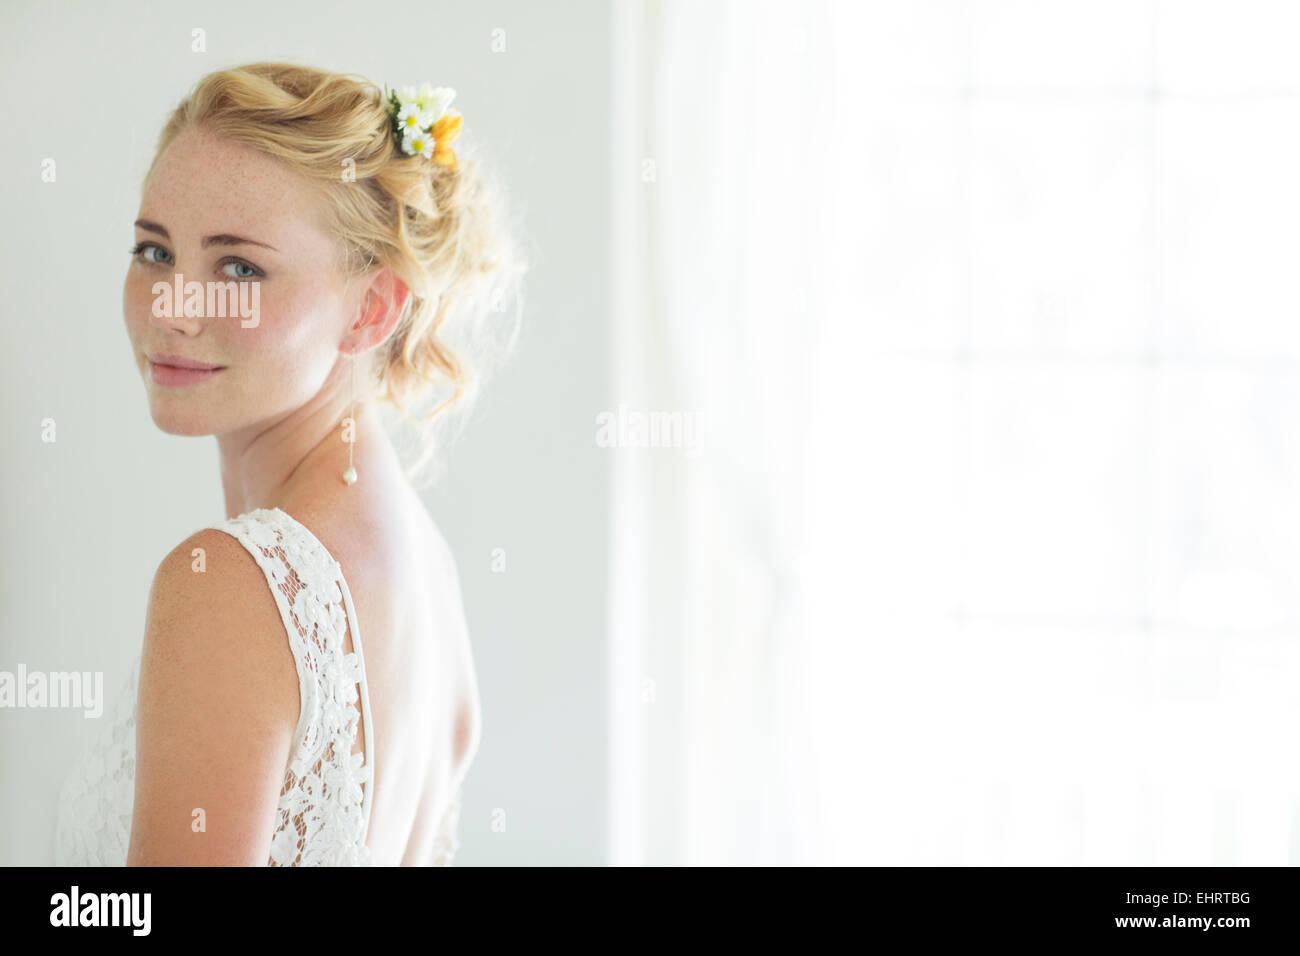 Portrait of bride in domestic room - Stock Image